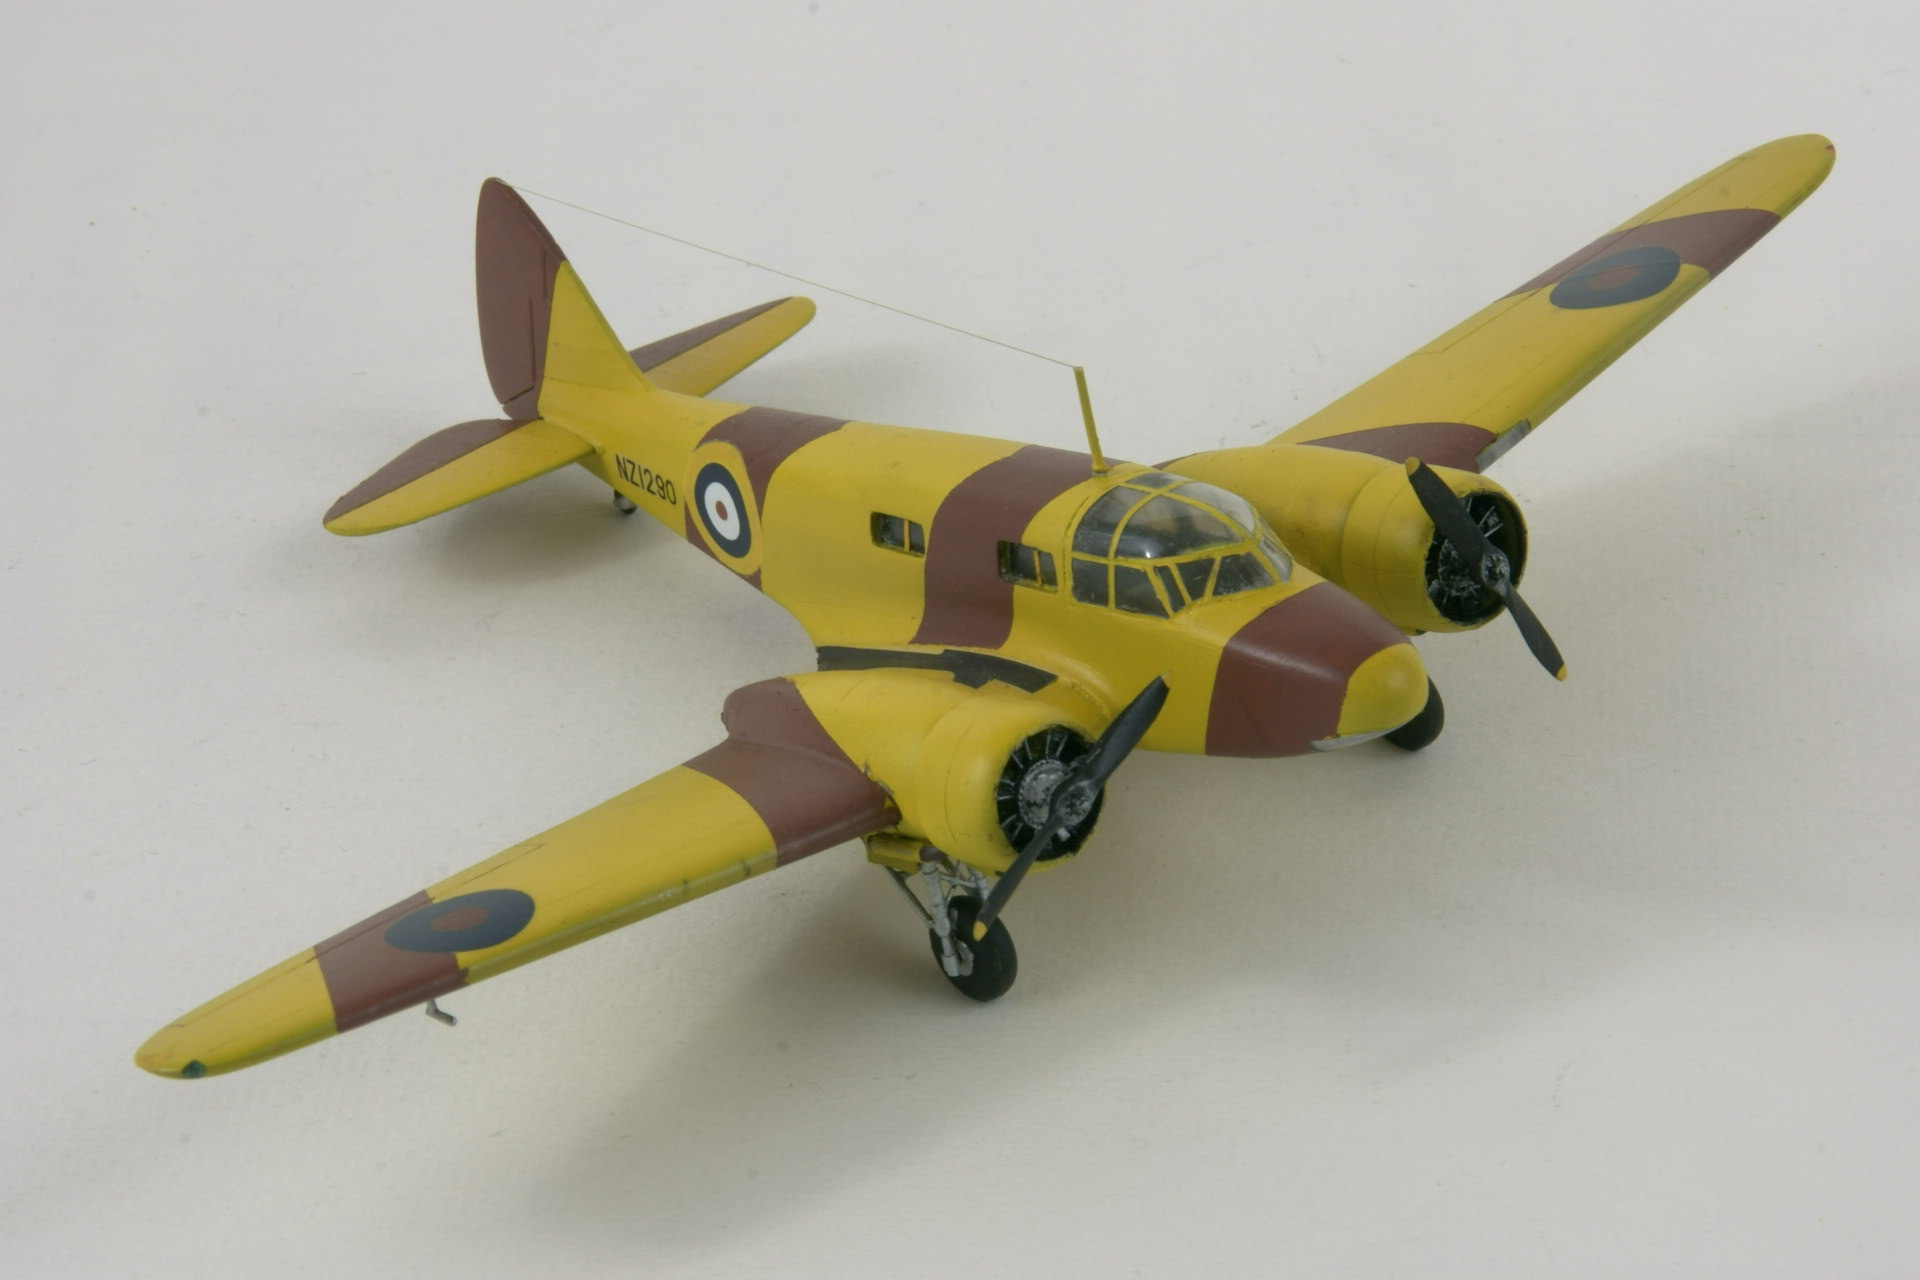 Airspeed as 10 oxford ii 4 1